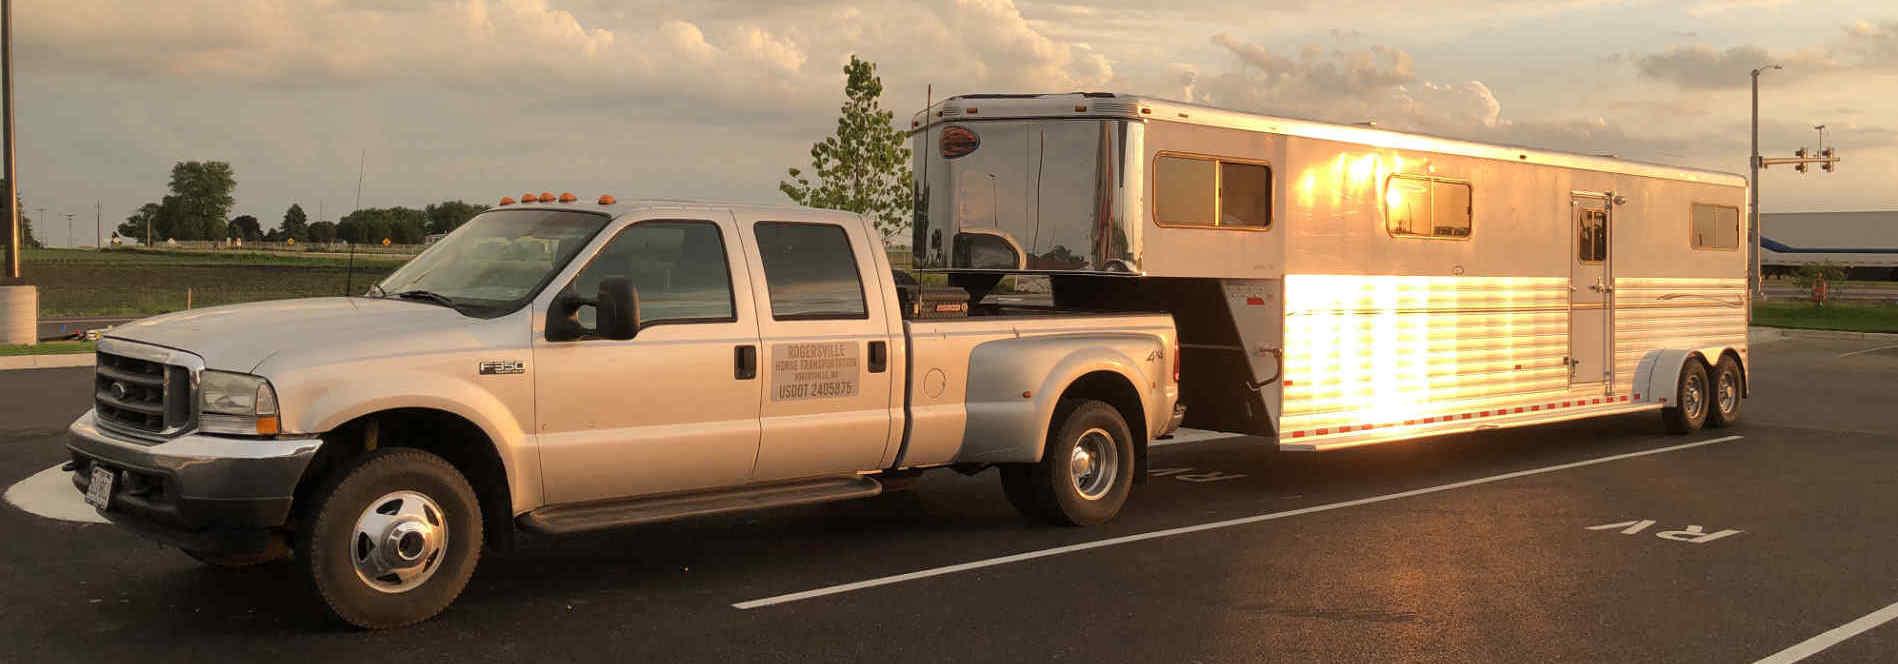 professional-horse-transport-04834.jpg